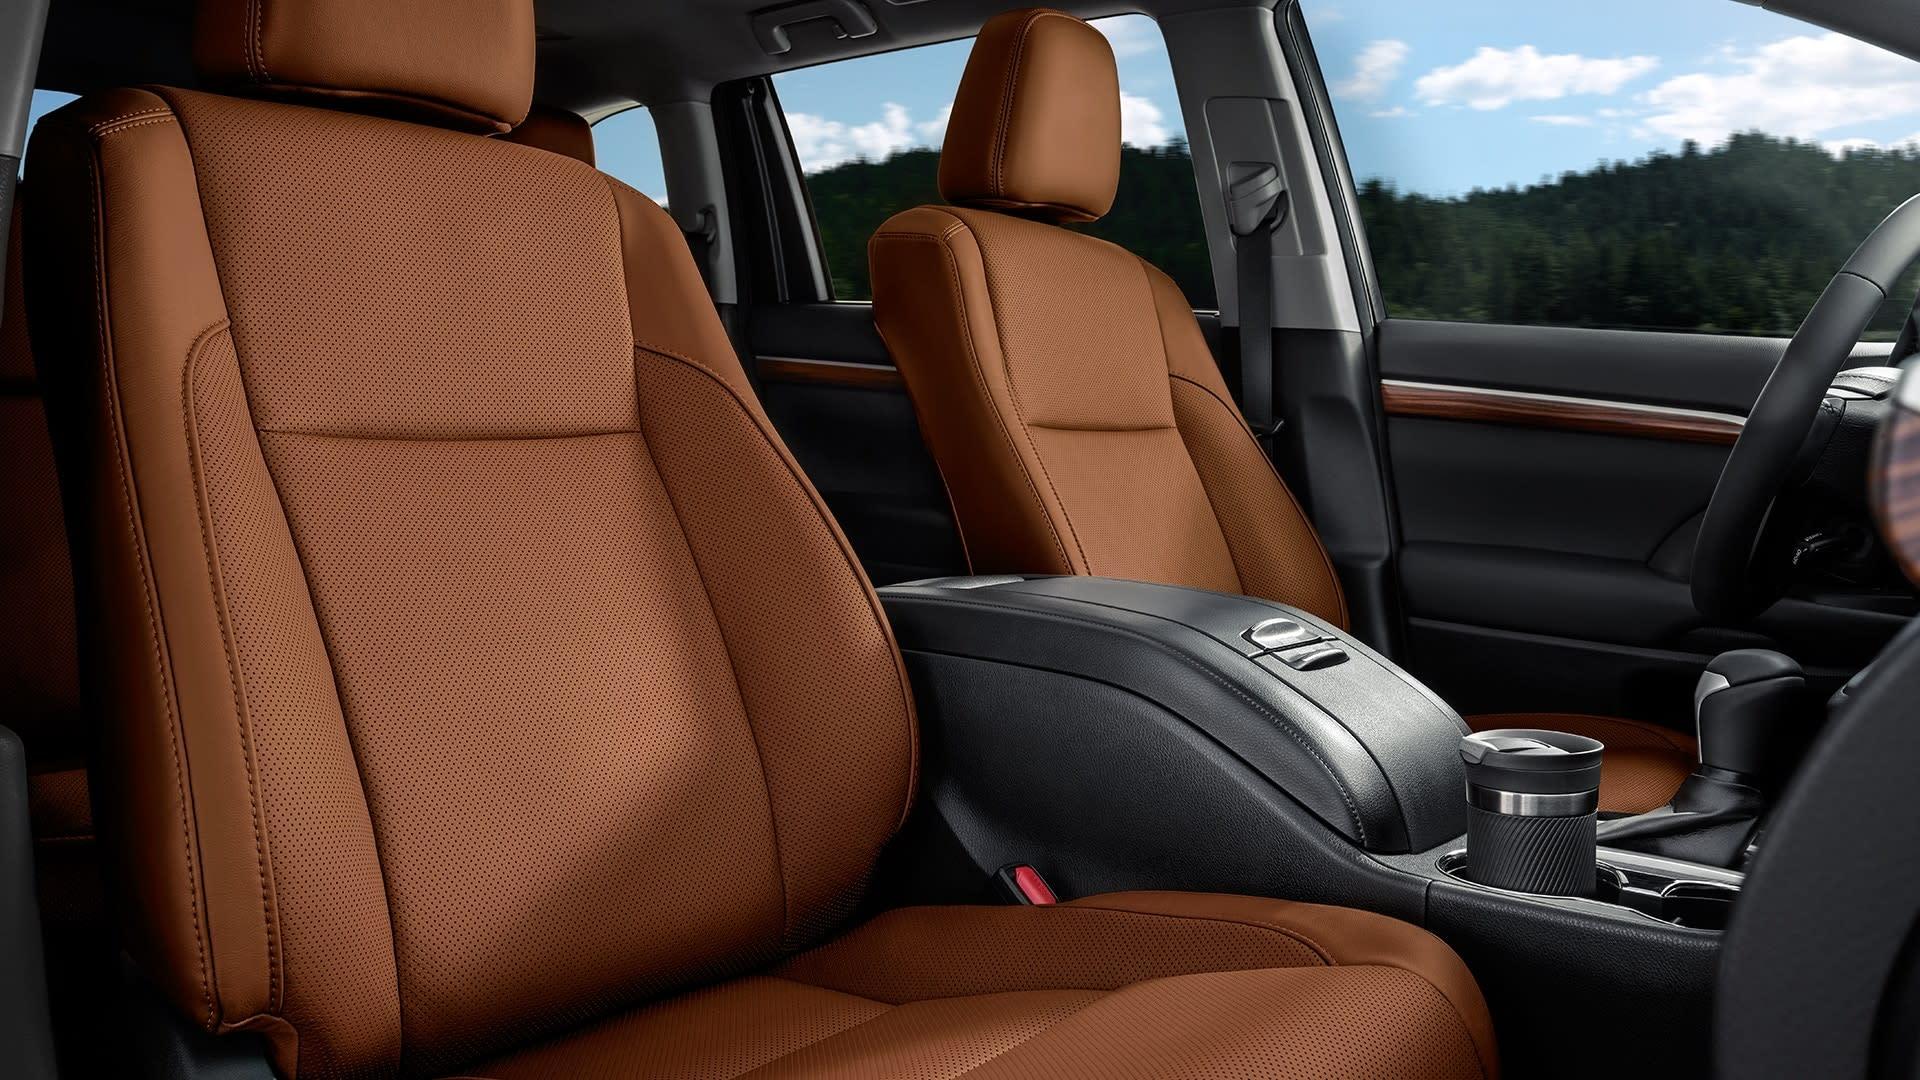 2019 Toyota Highlander Interior Detailing